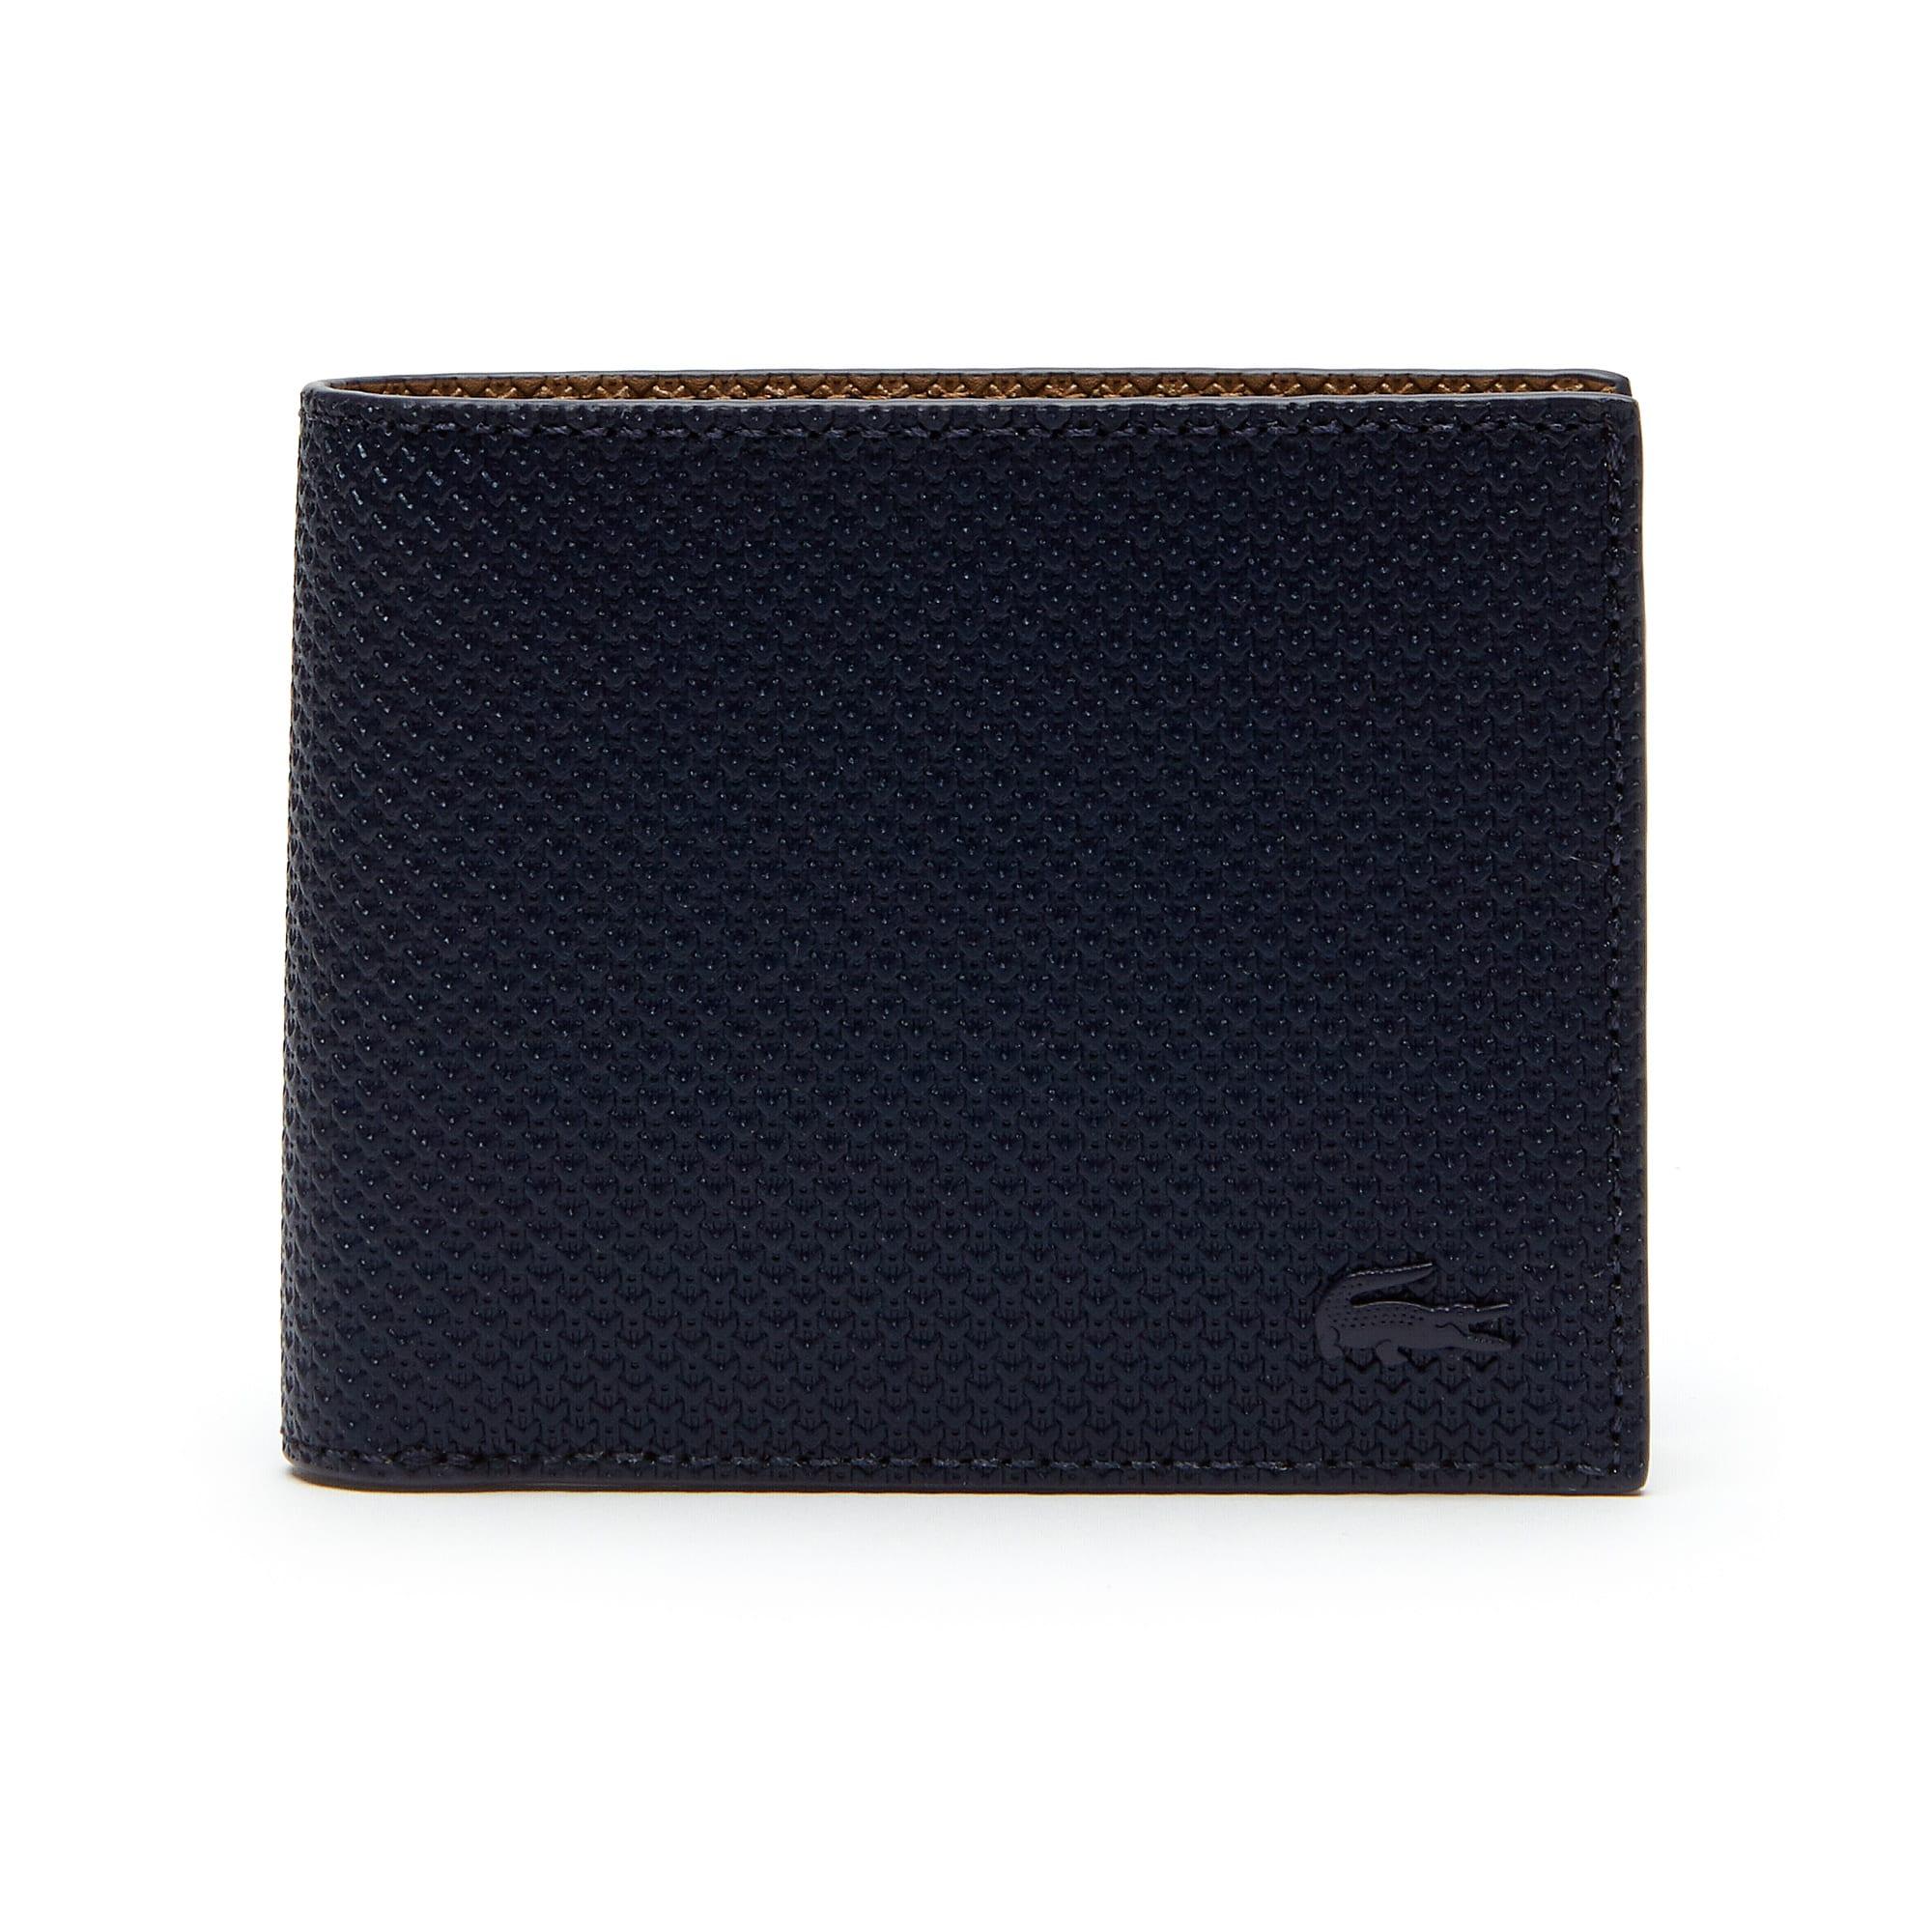 Men's Chantaco Monochrome Coated Leather Flat Wallet